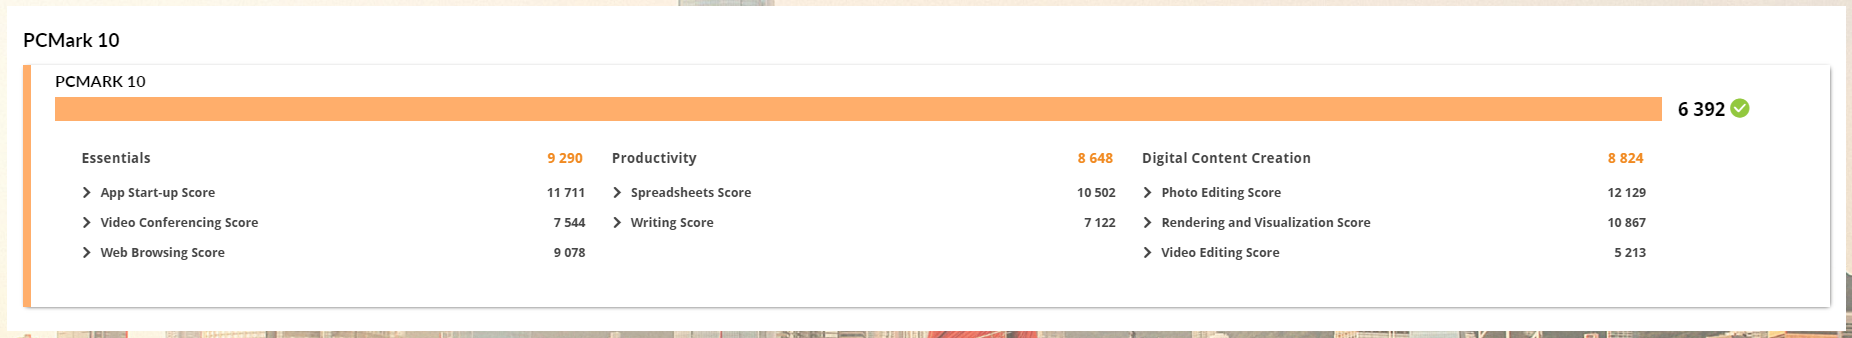 GALLERIA RM5R-R36のPCMark10のベンチマーク結果